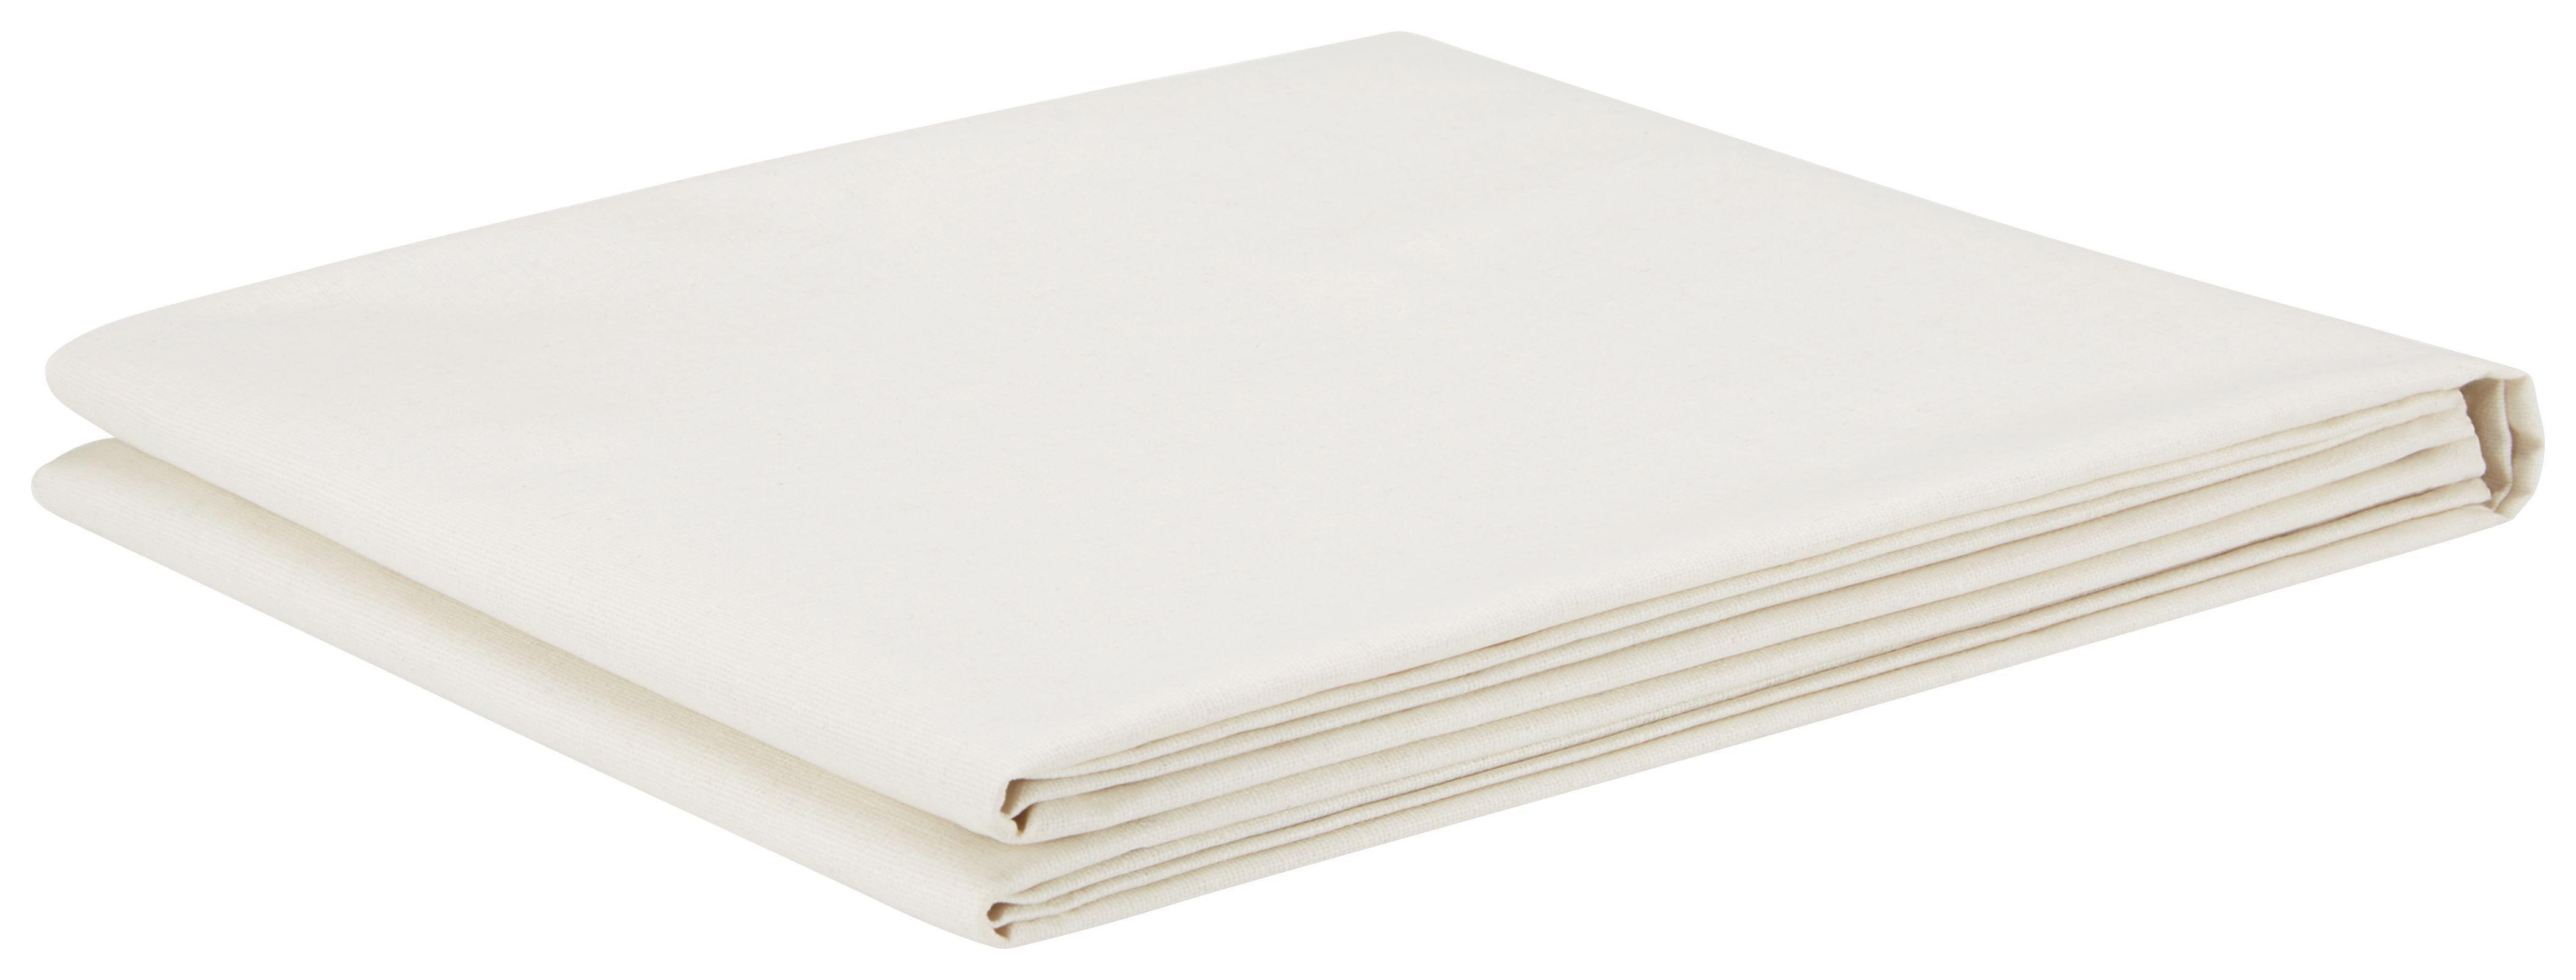 Terítő Cornelia - fehér, textil (130/160cm) - MÖMAX modern living